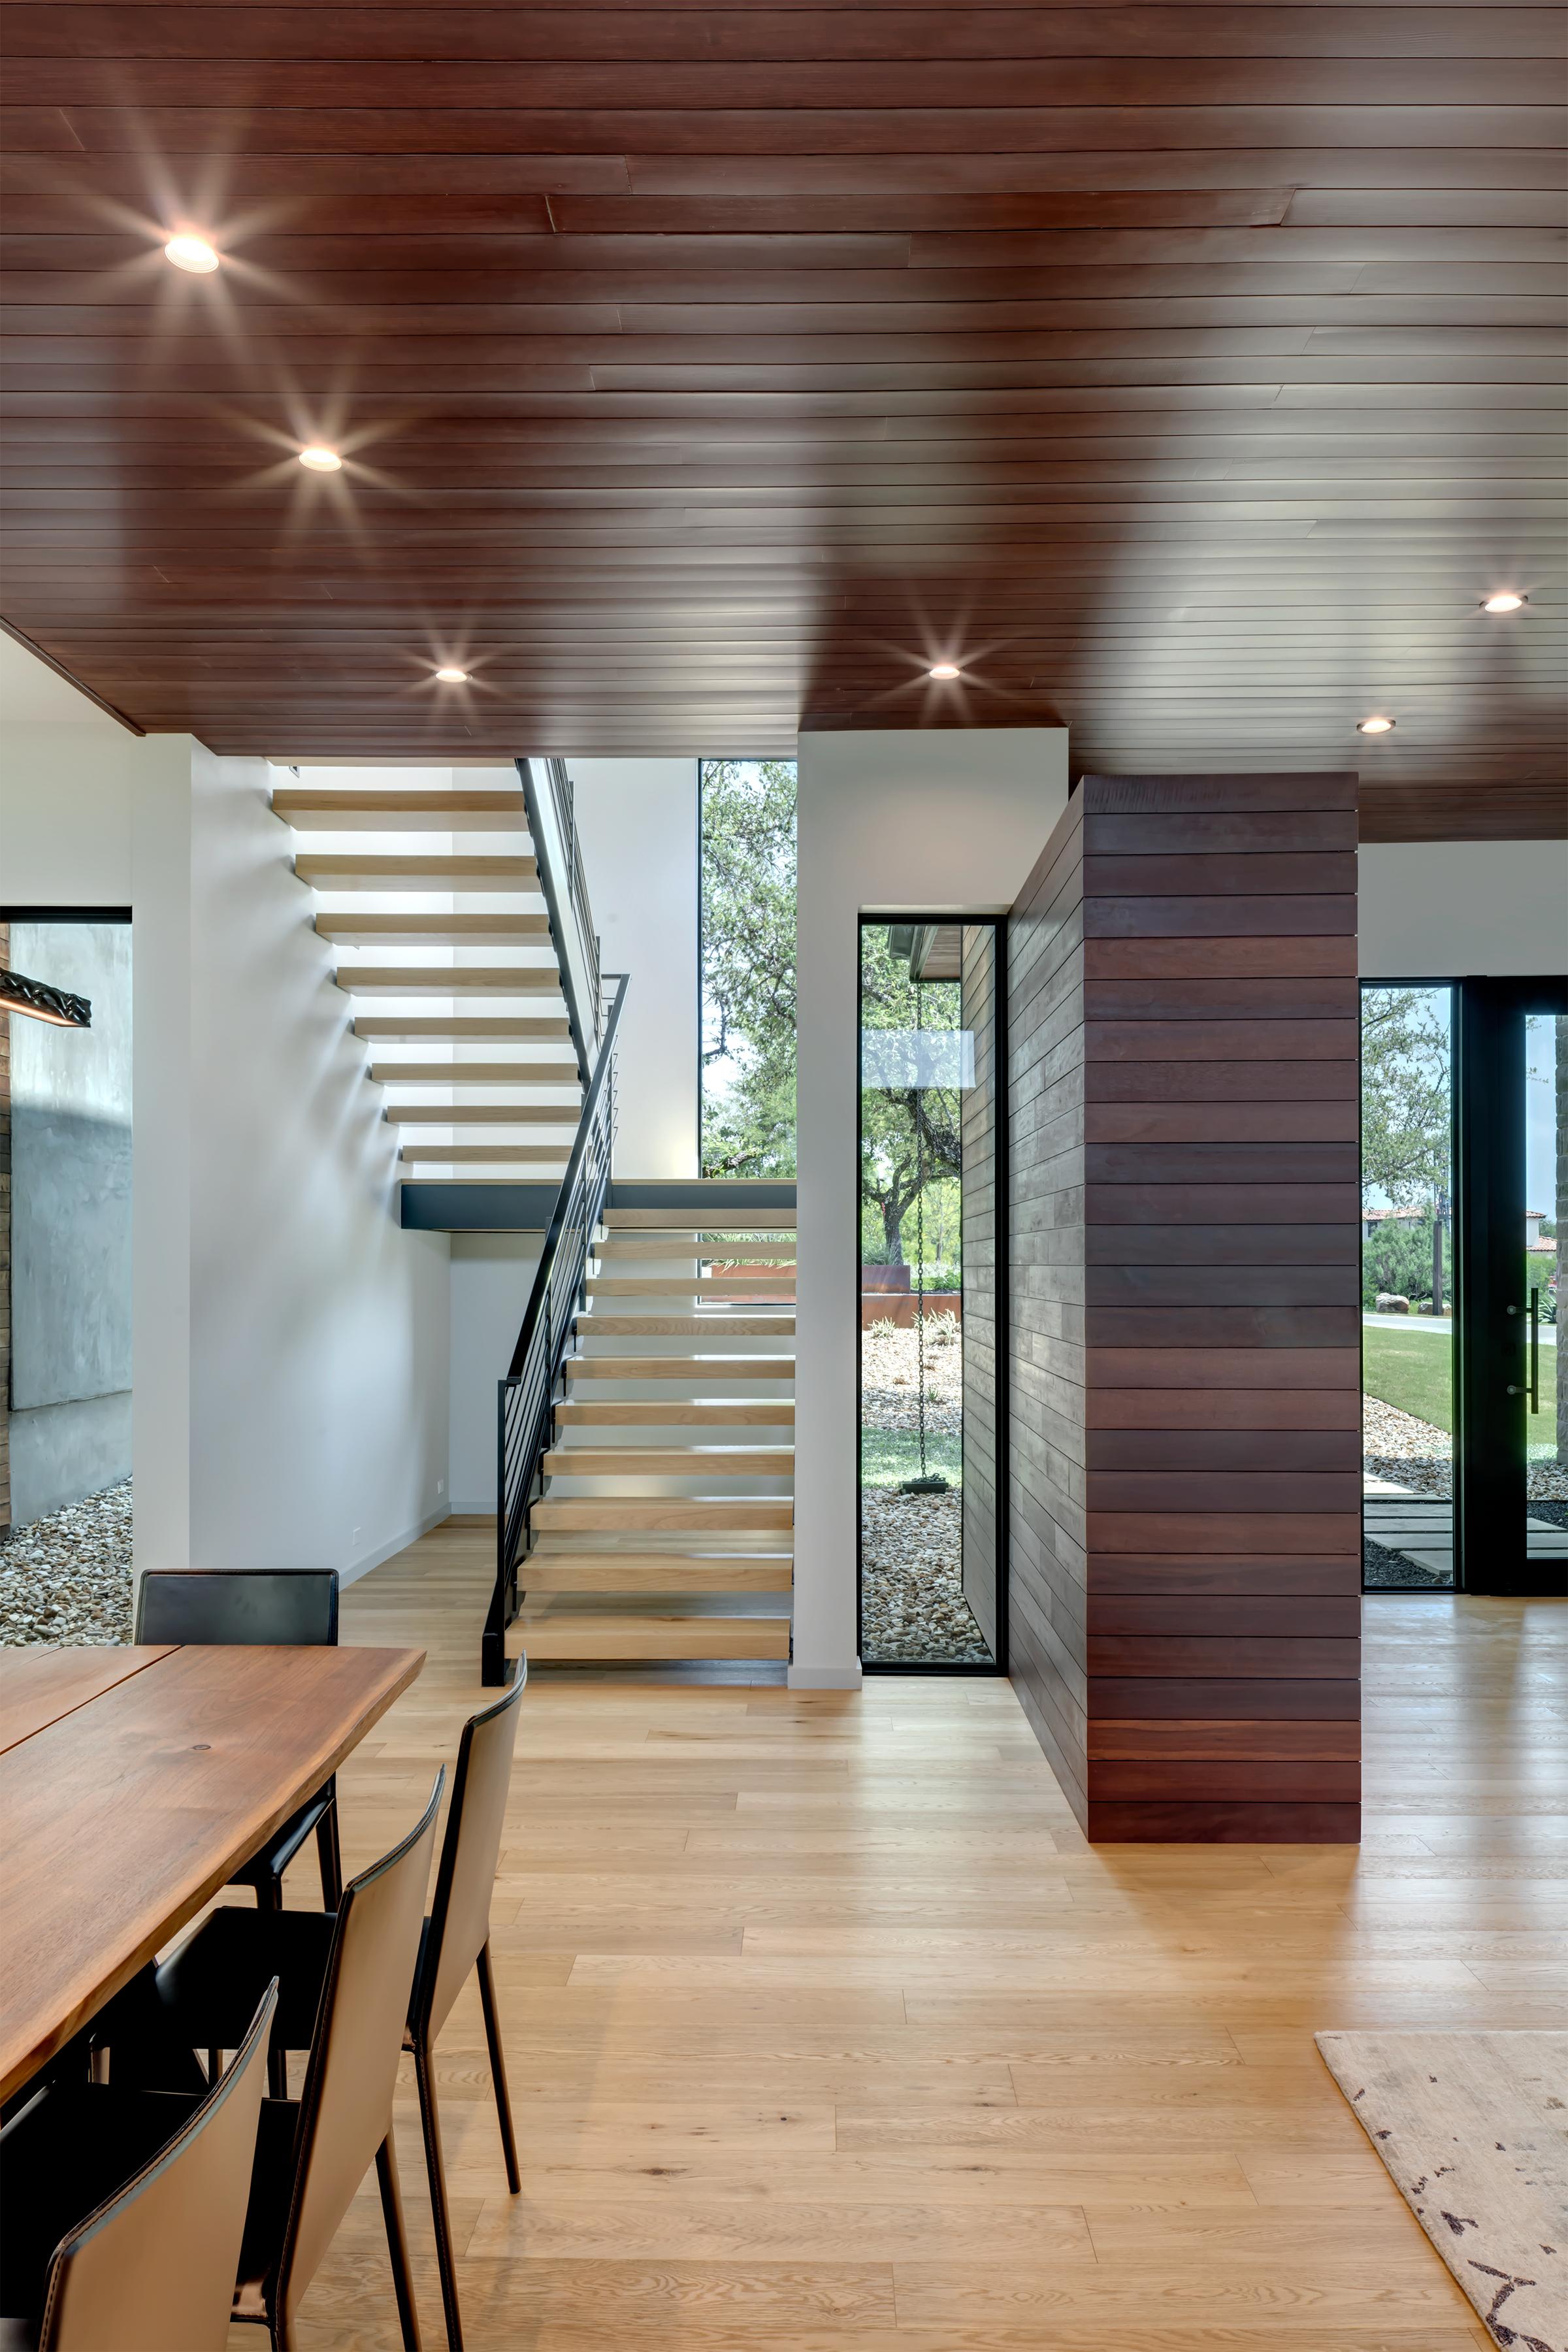 Matt Fajkus MF Architecture_Control-Shift House_Interior Photo 4 by Charles Davis Smith.jpg